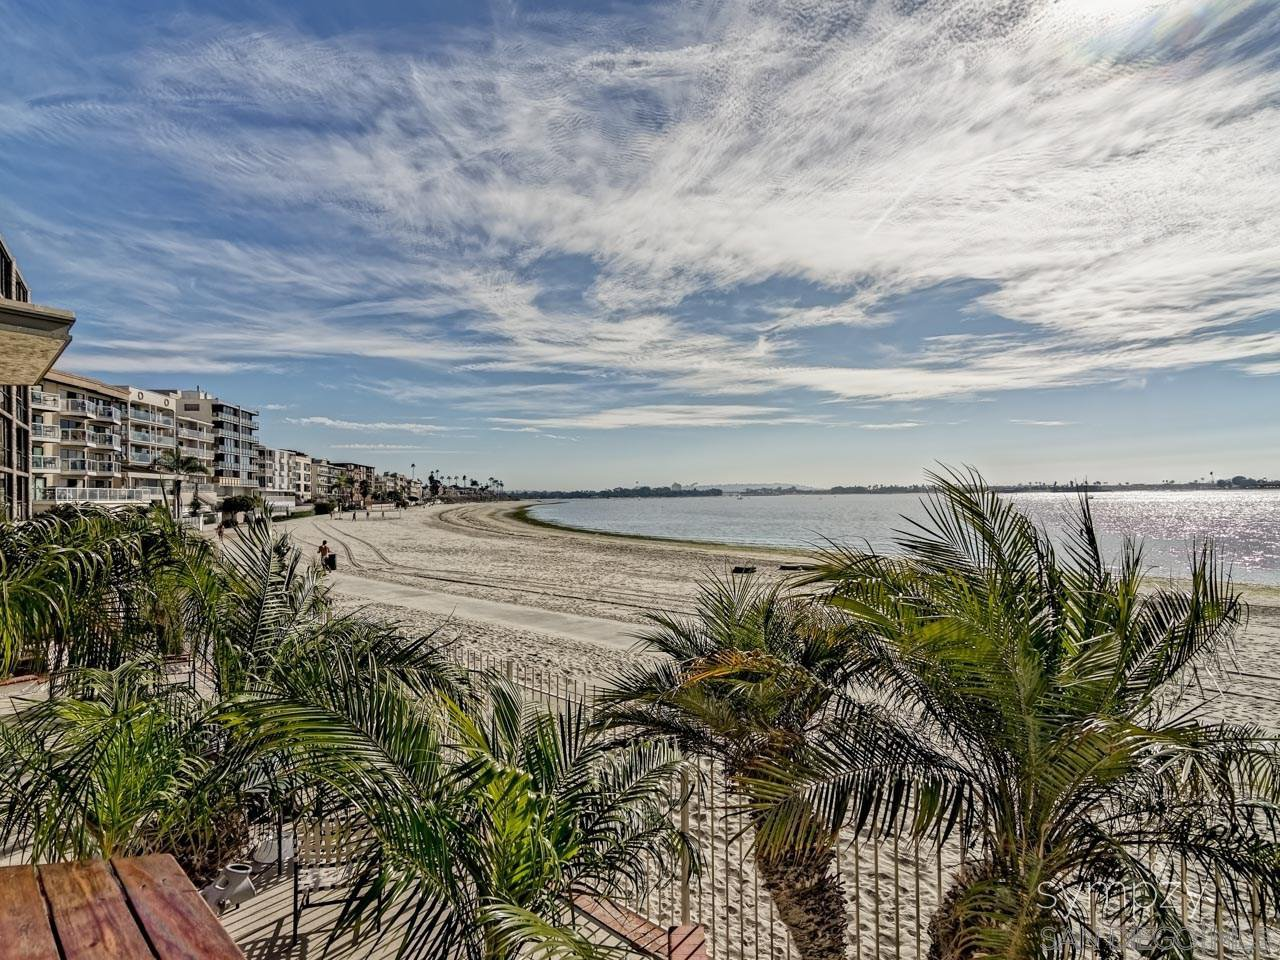 Main Photo: PACIFIC BEACH Condo for rent : 3 bedrooms : 3920 Riviera Drive #V